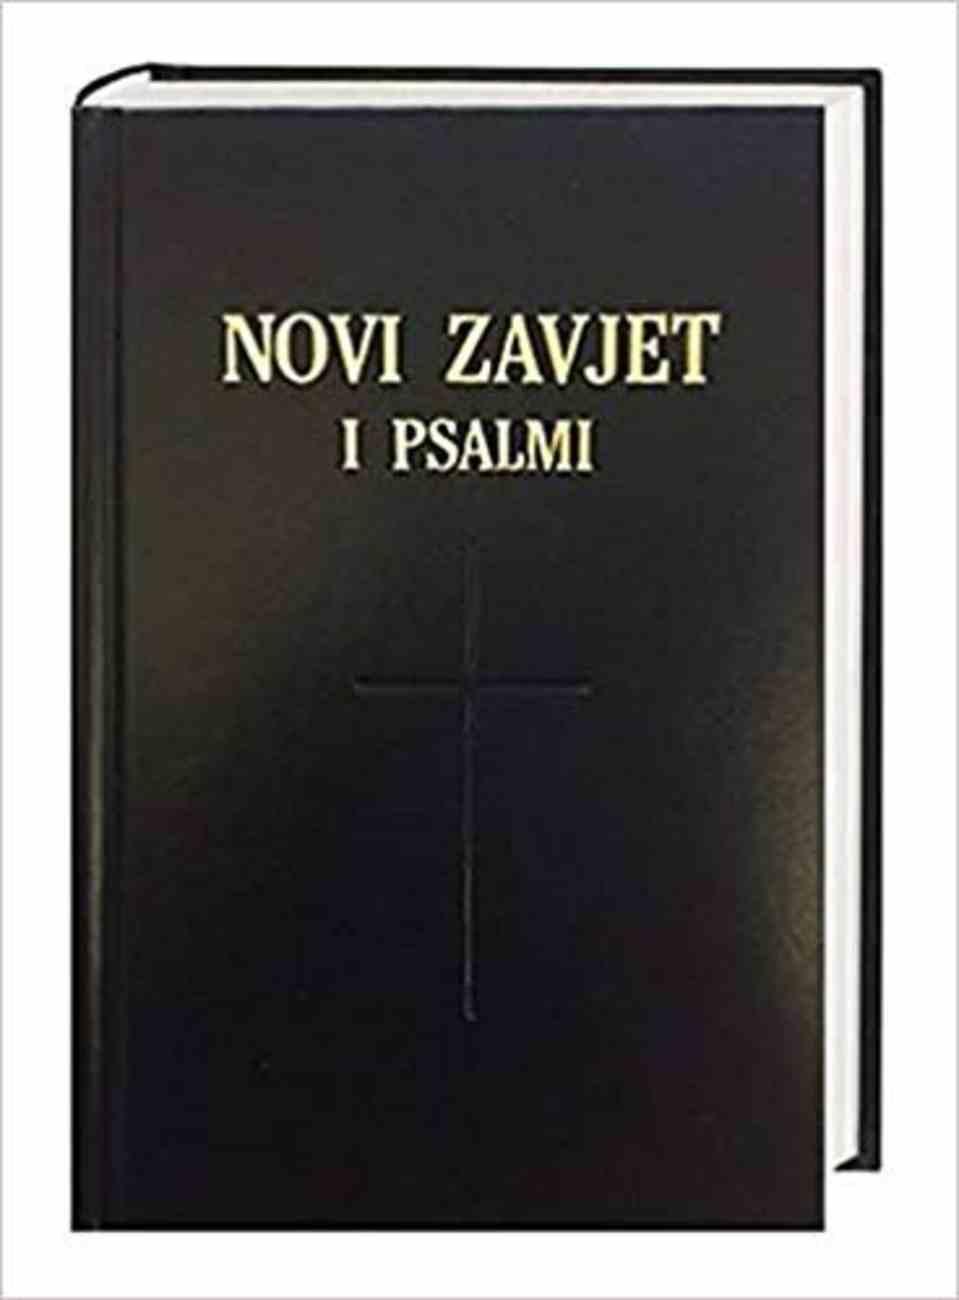 Croatian New Testament and Psalms Traditional Translation Imitation Leather